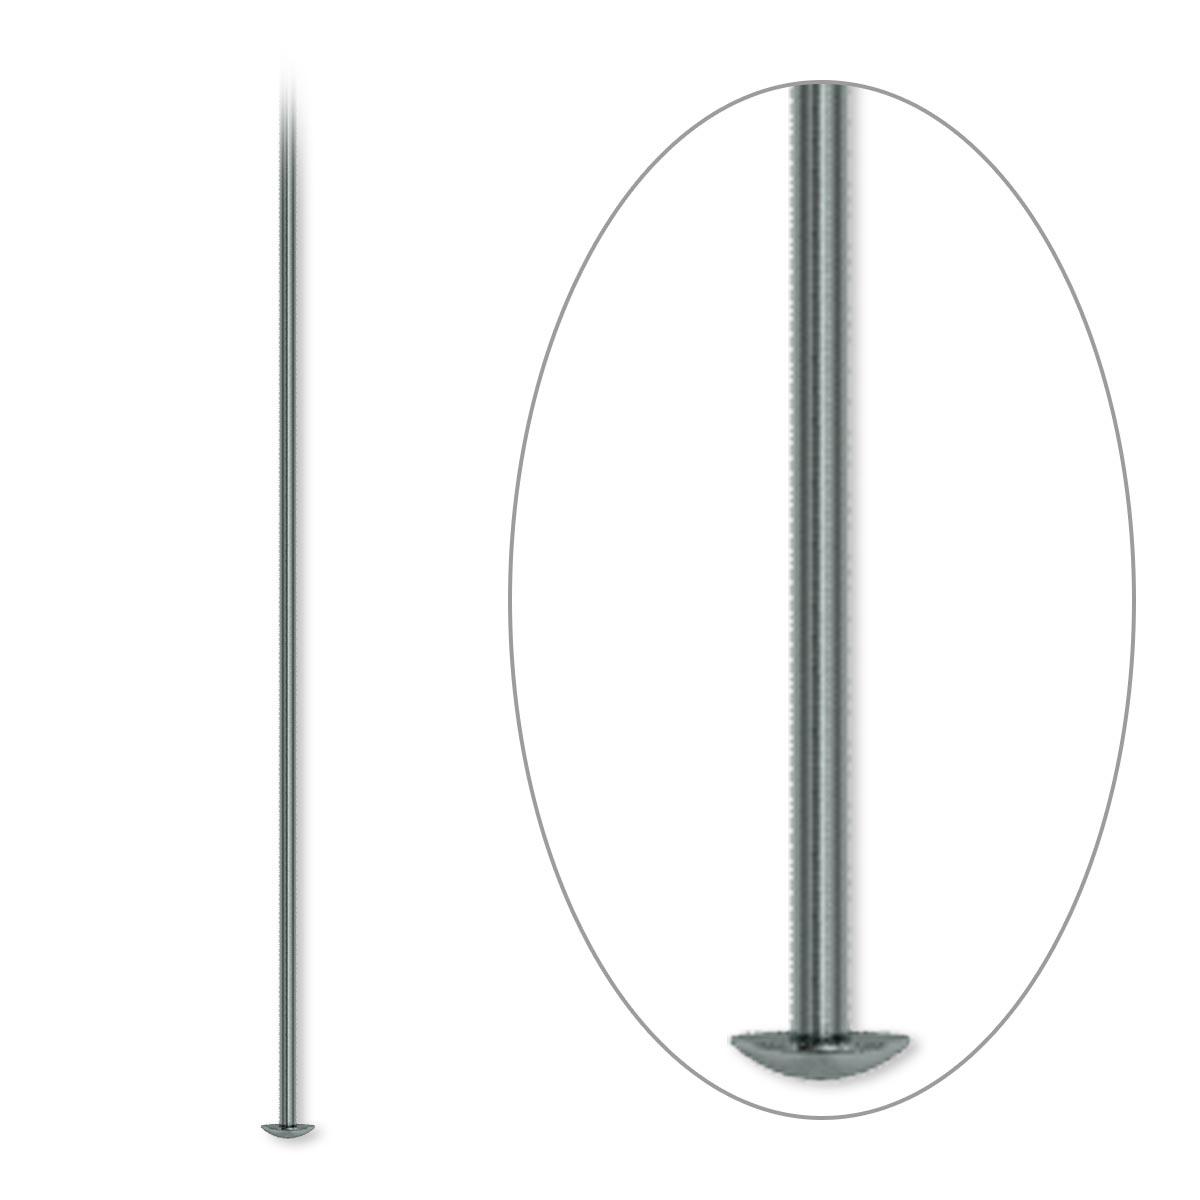 Head Pin Gunmetal Plated Brass 4 Inch 21 Gauge Sold